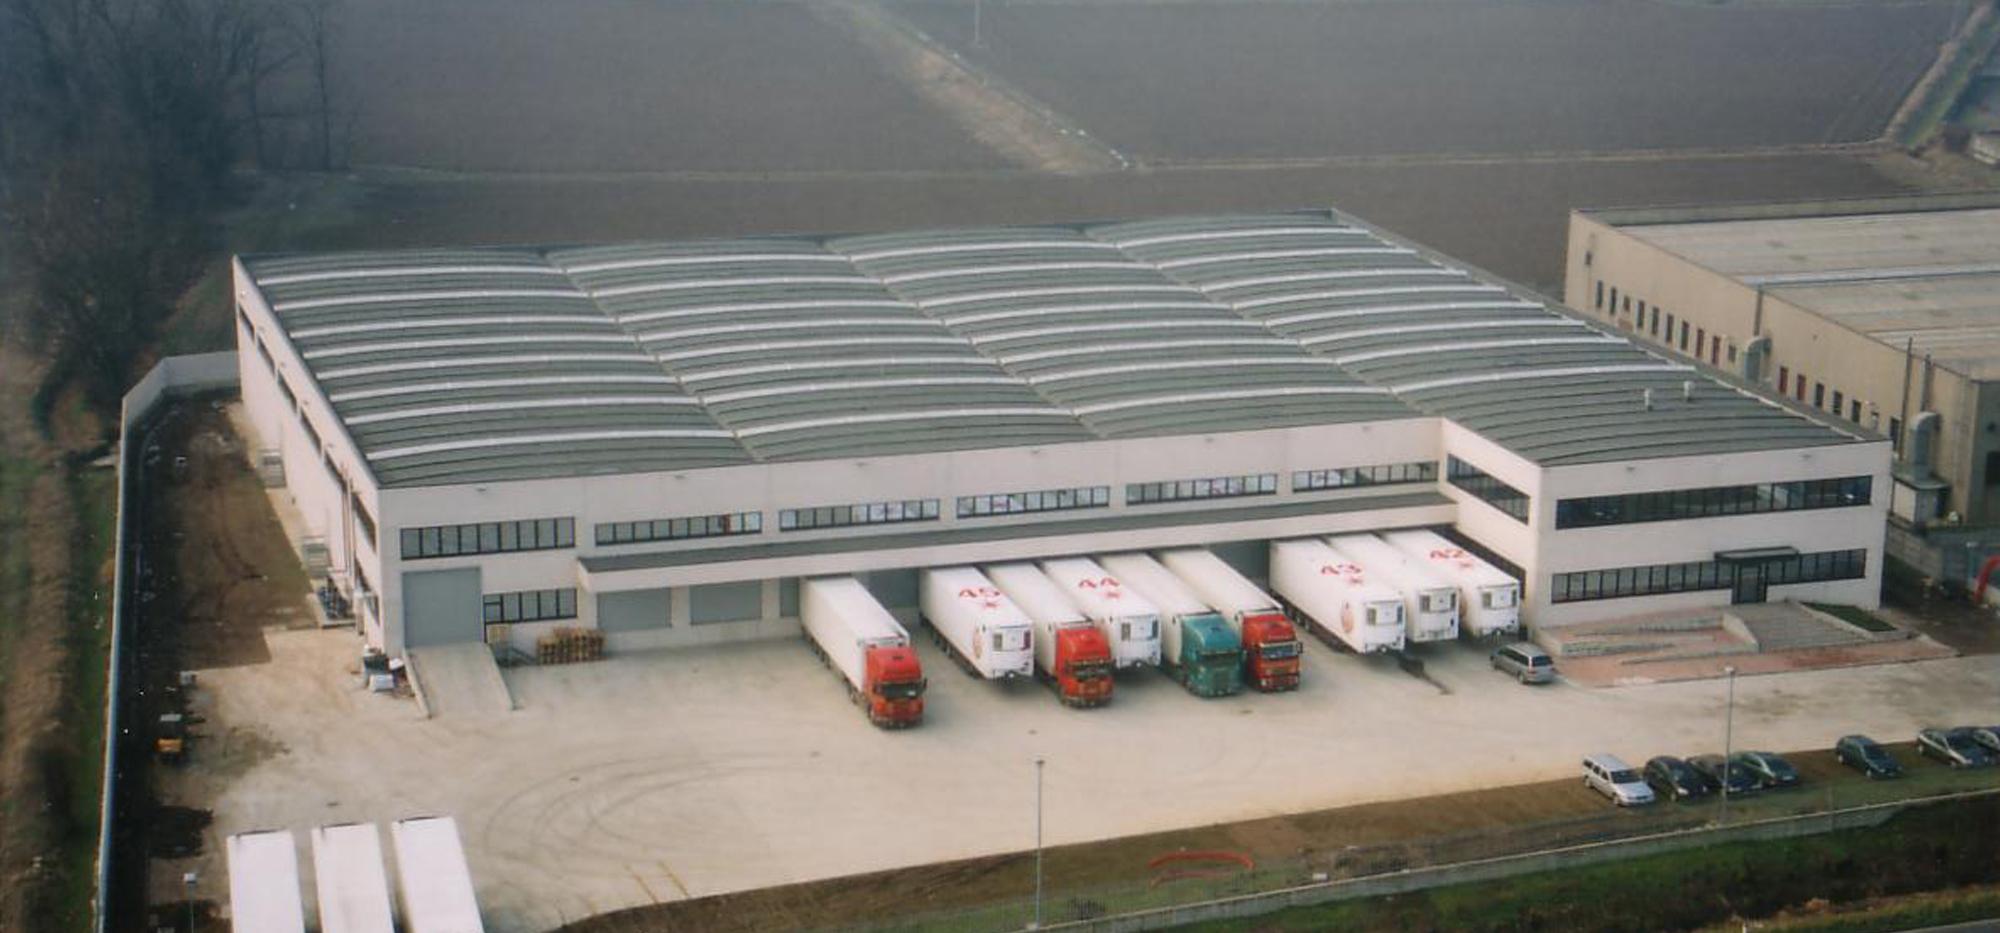 ImmobileVercesiTrasporti03